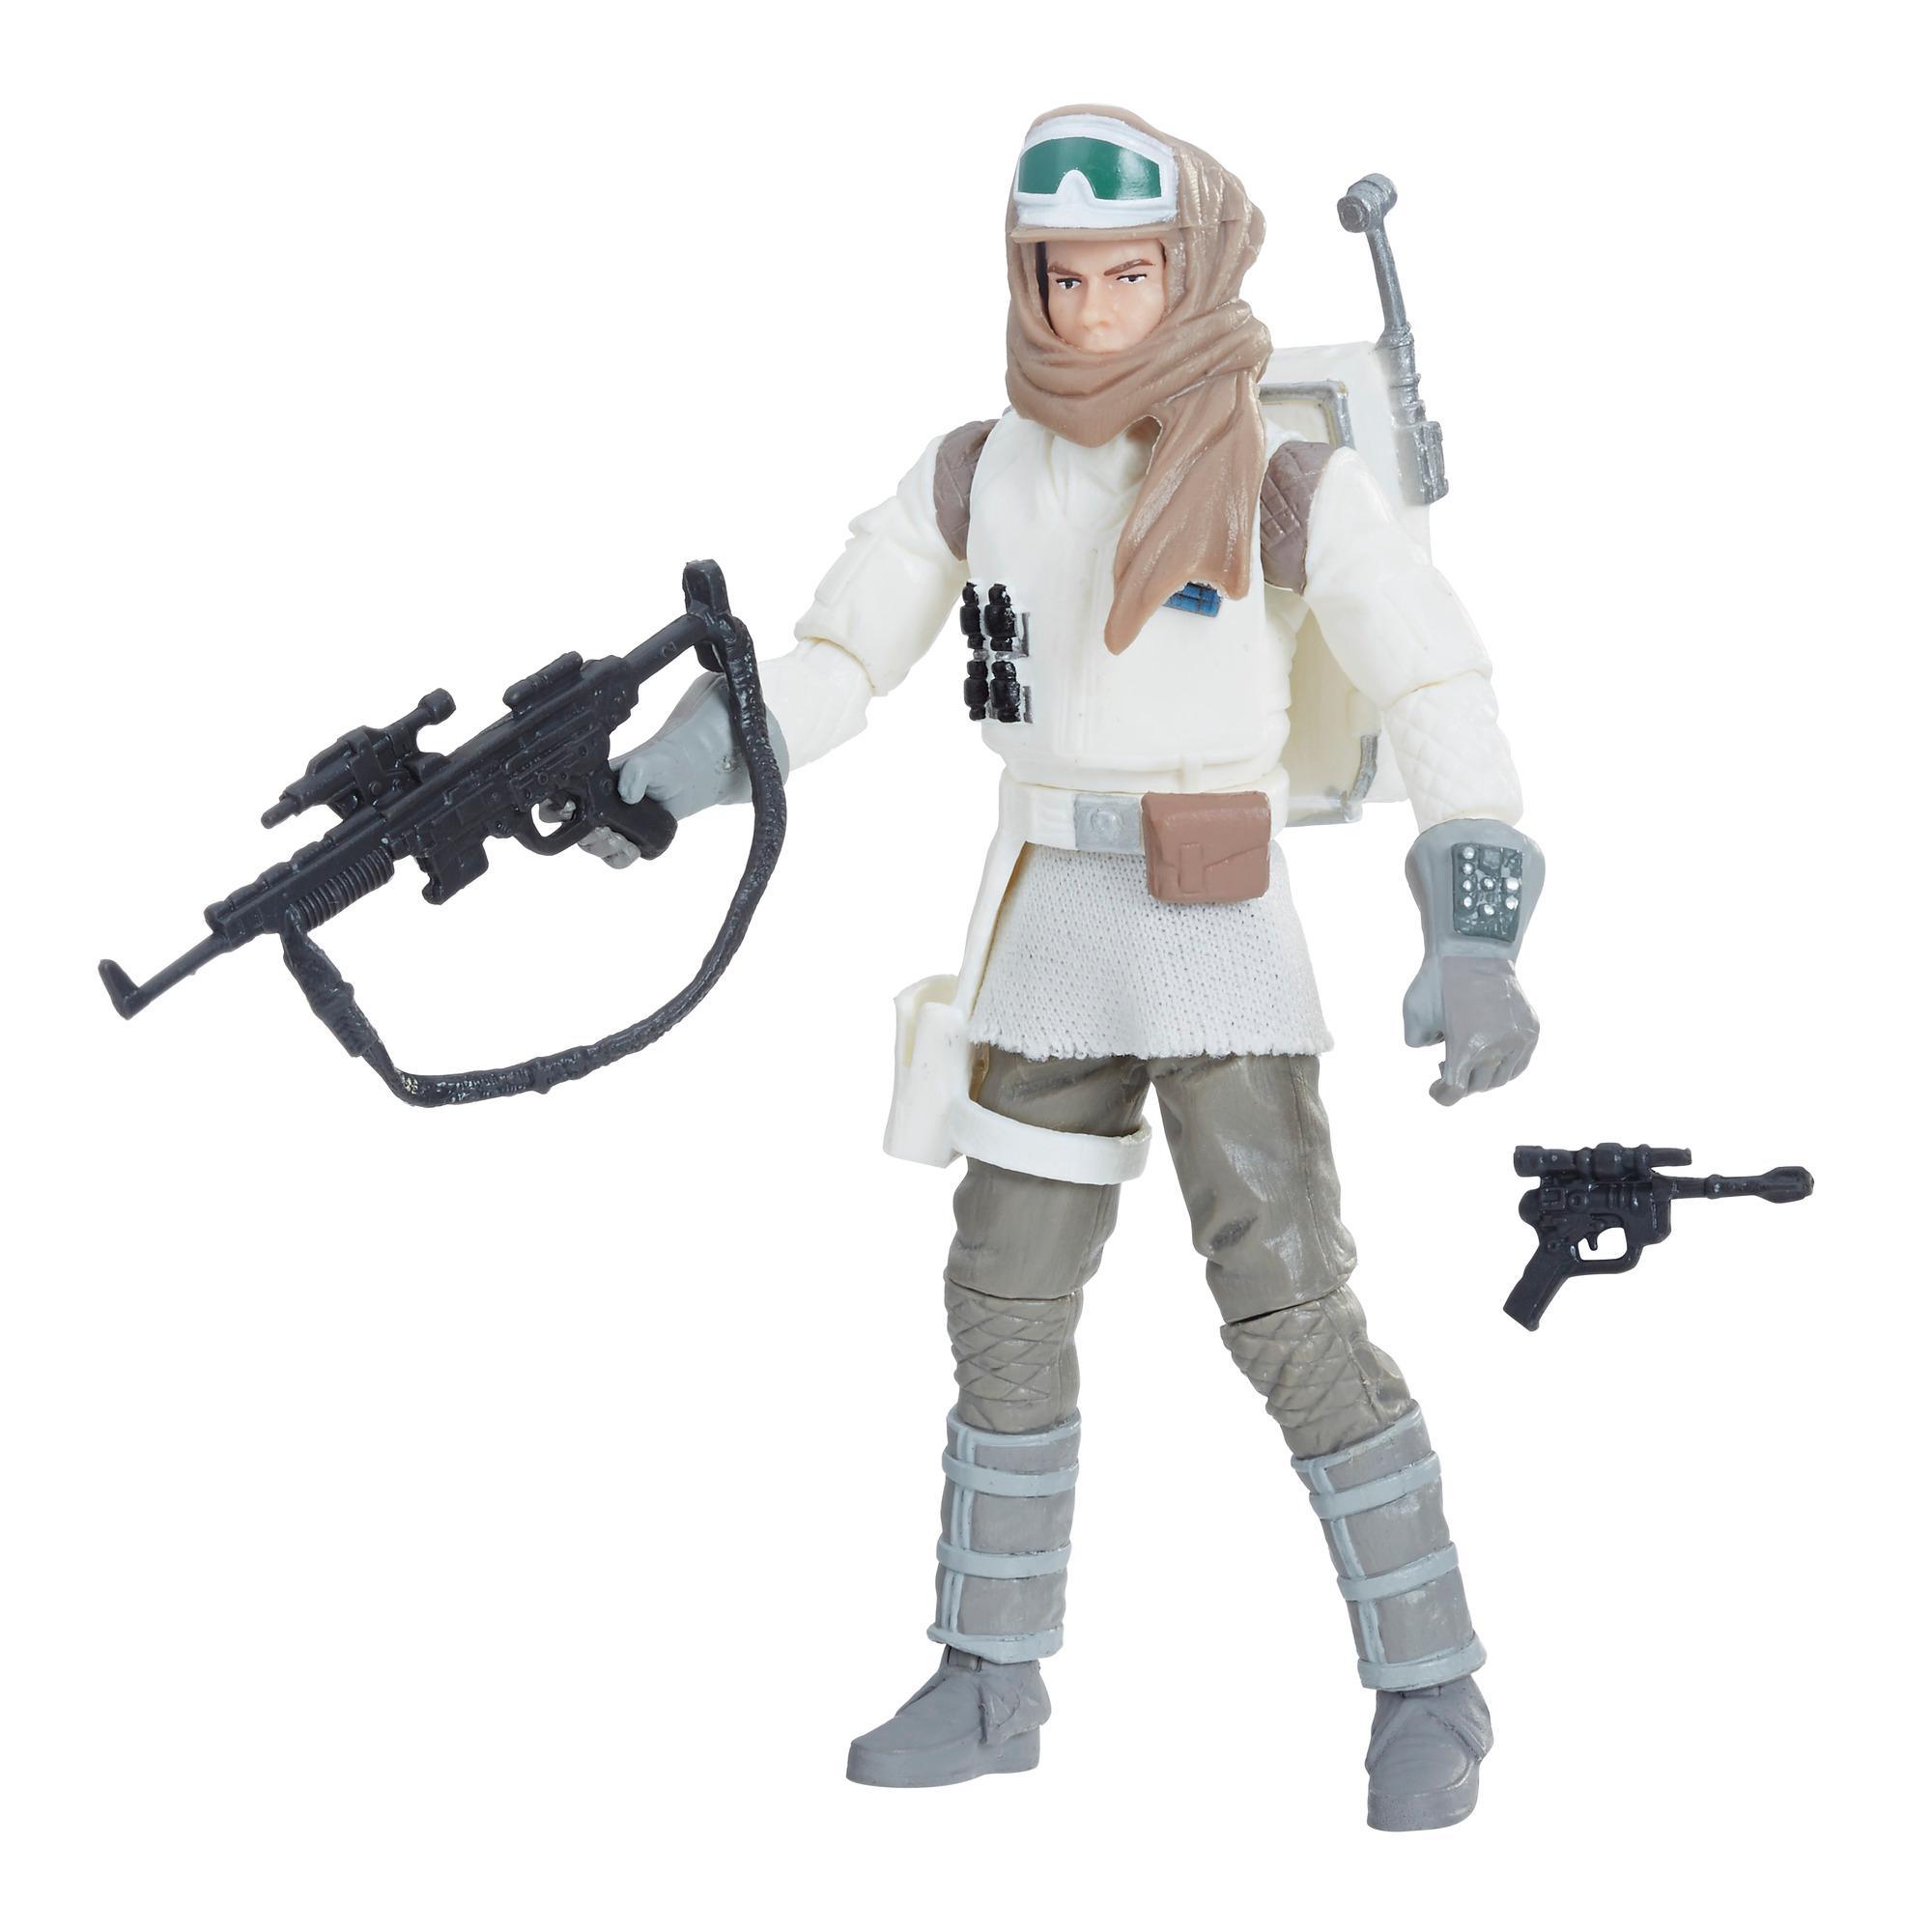 Star Wars - Collection Vintage - Figurine soldat rebelle (Hoth) de 9,5 cm